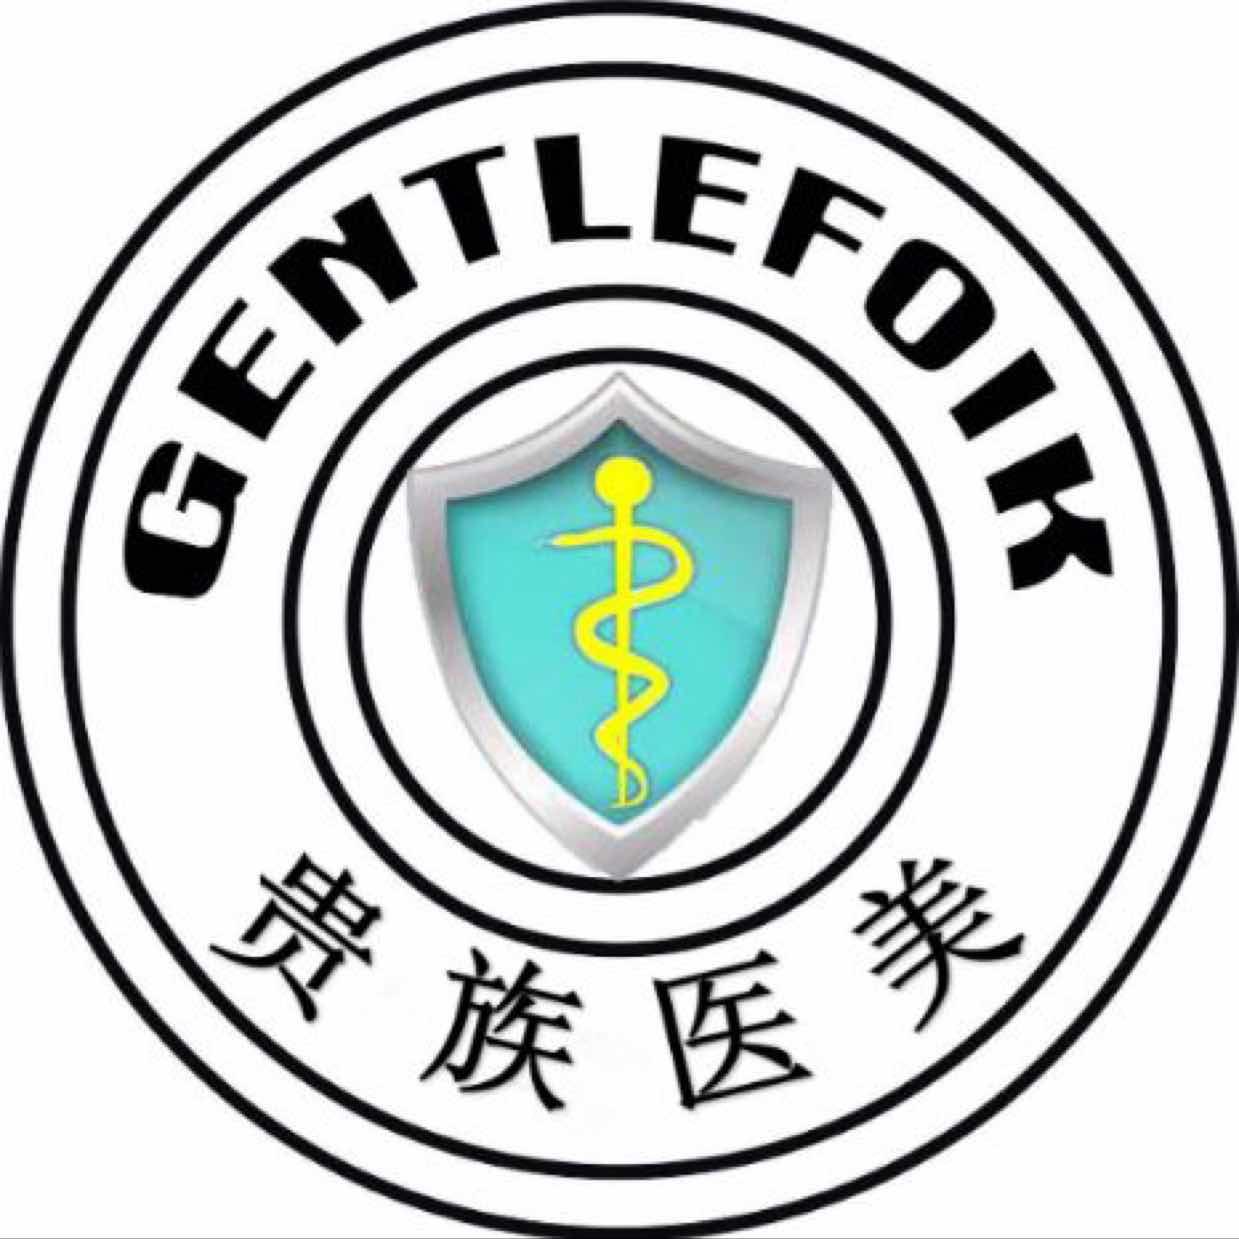 gentlefoik_logo